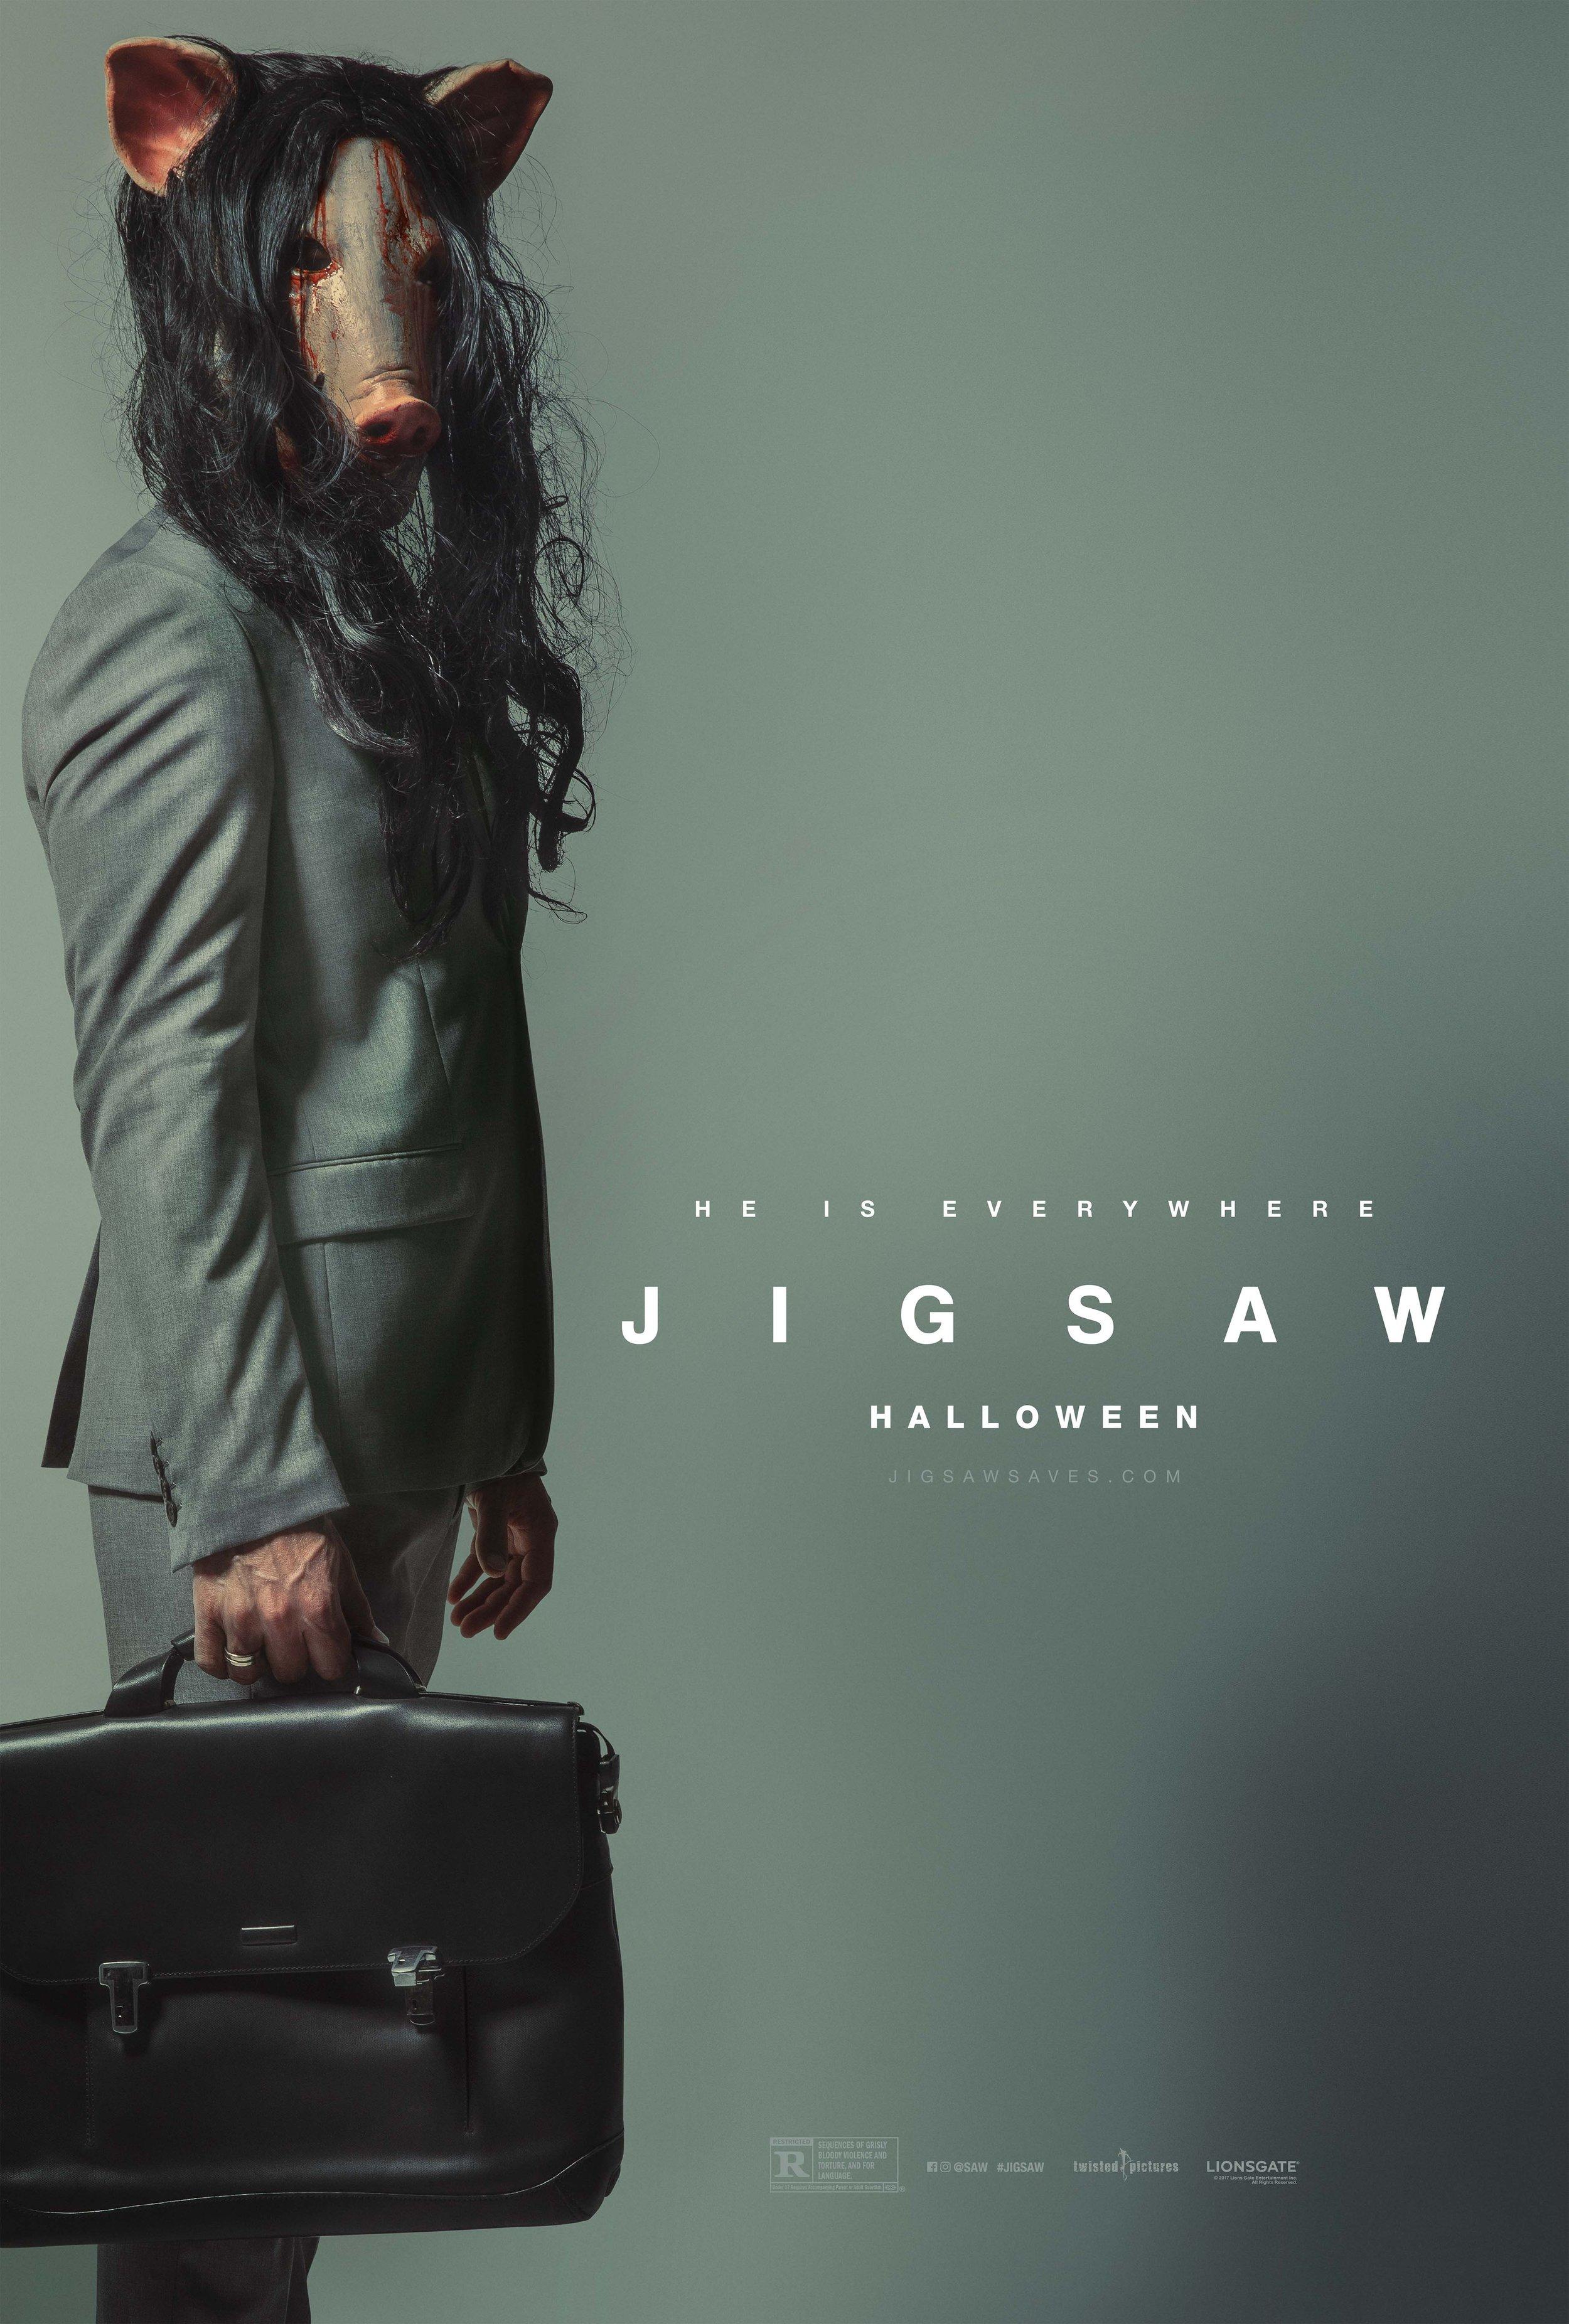 Jigsaw: He is Everywhere